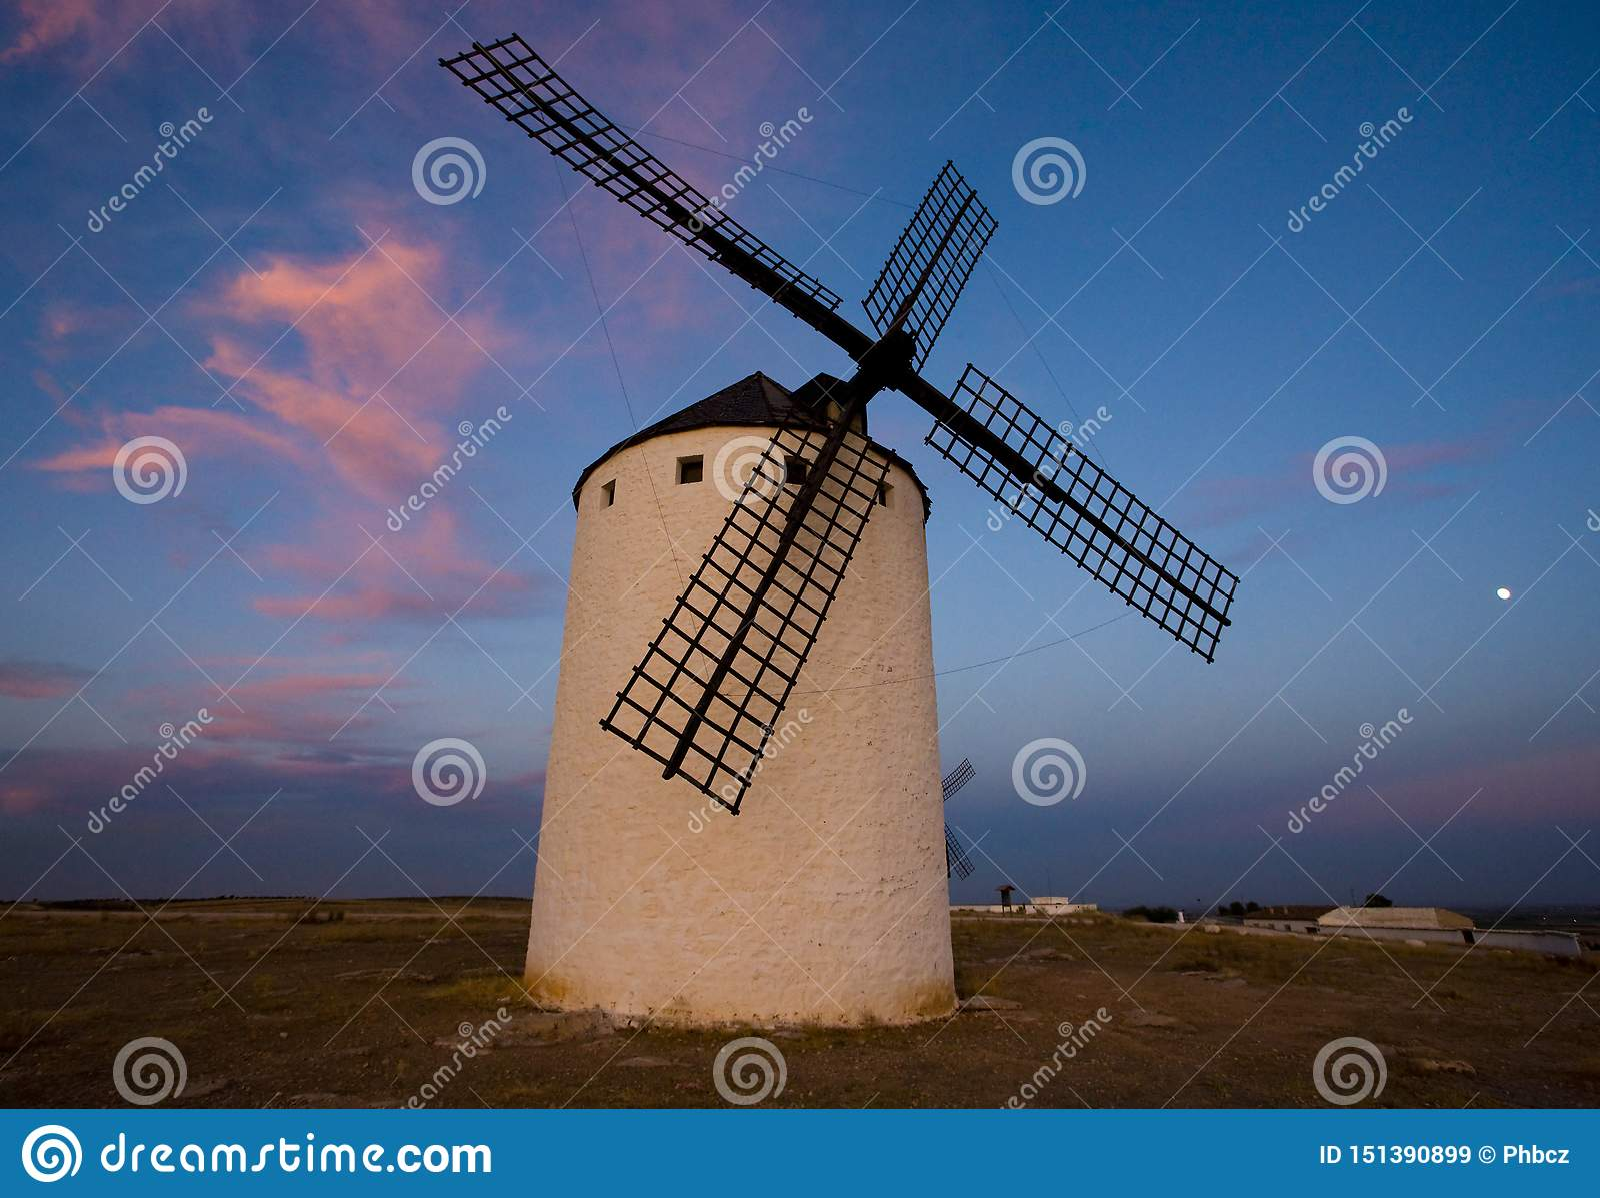 Väderkvarn Campo de Criptana, Castile-La Mancha, Spanien